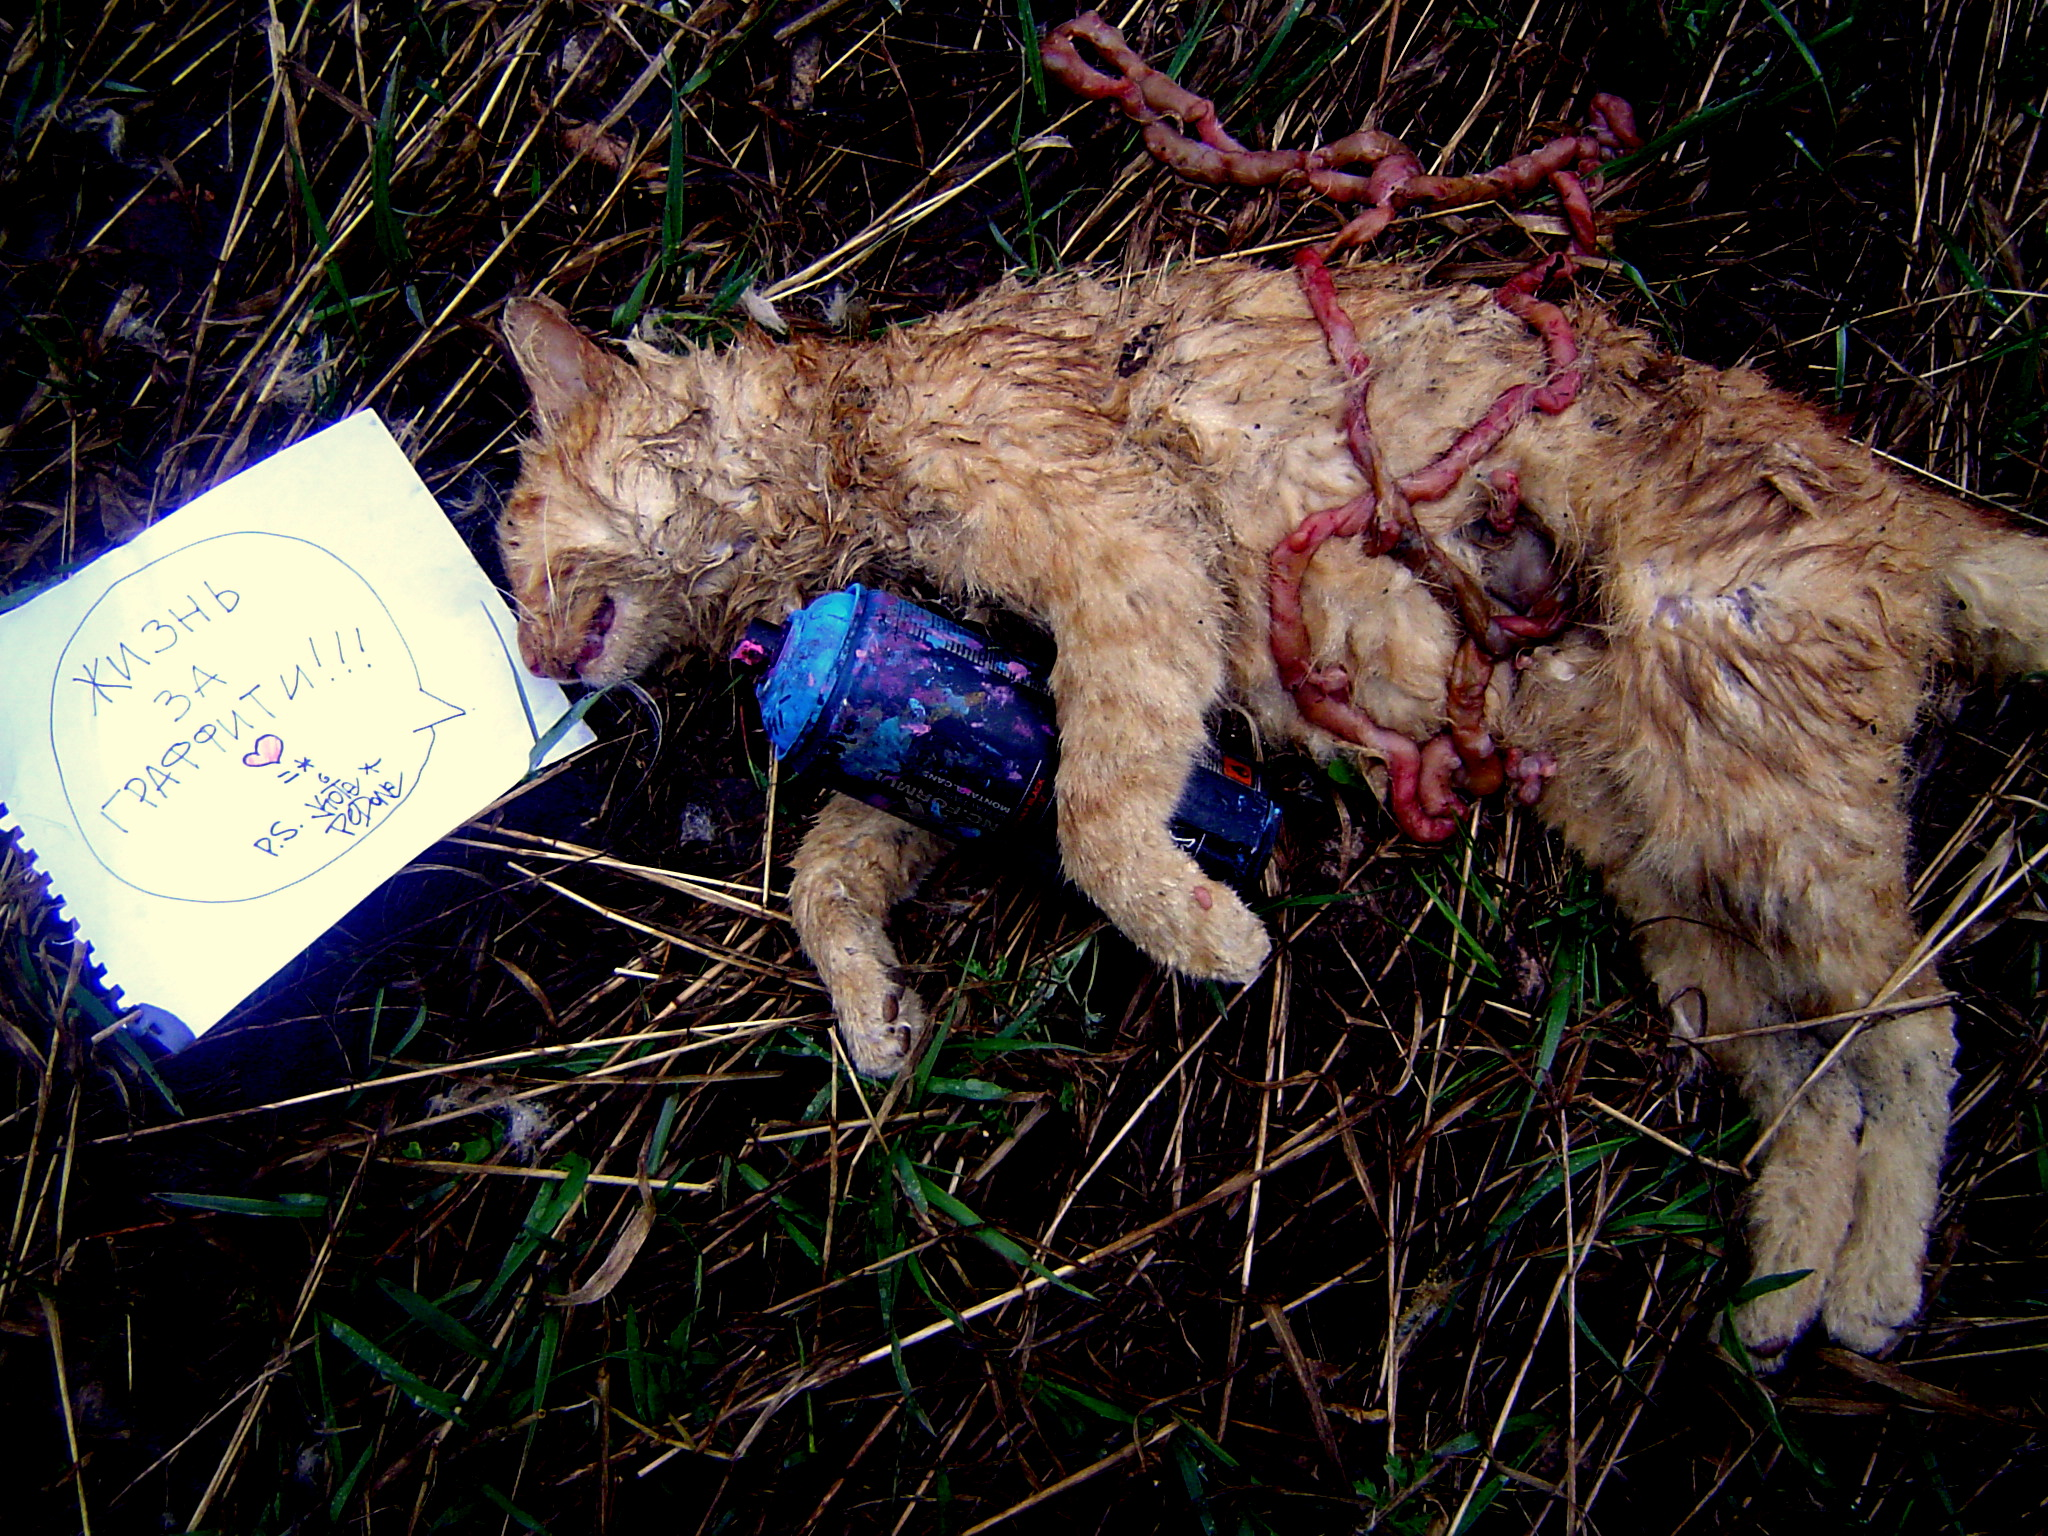 Картинки с убитыми кошками